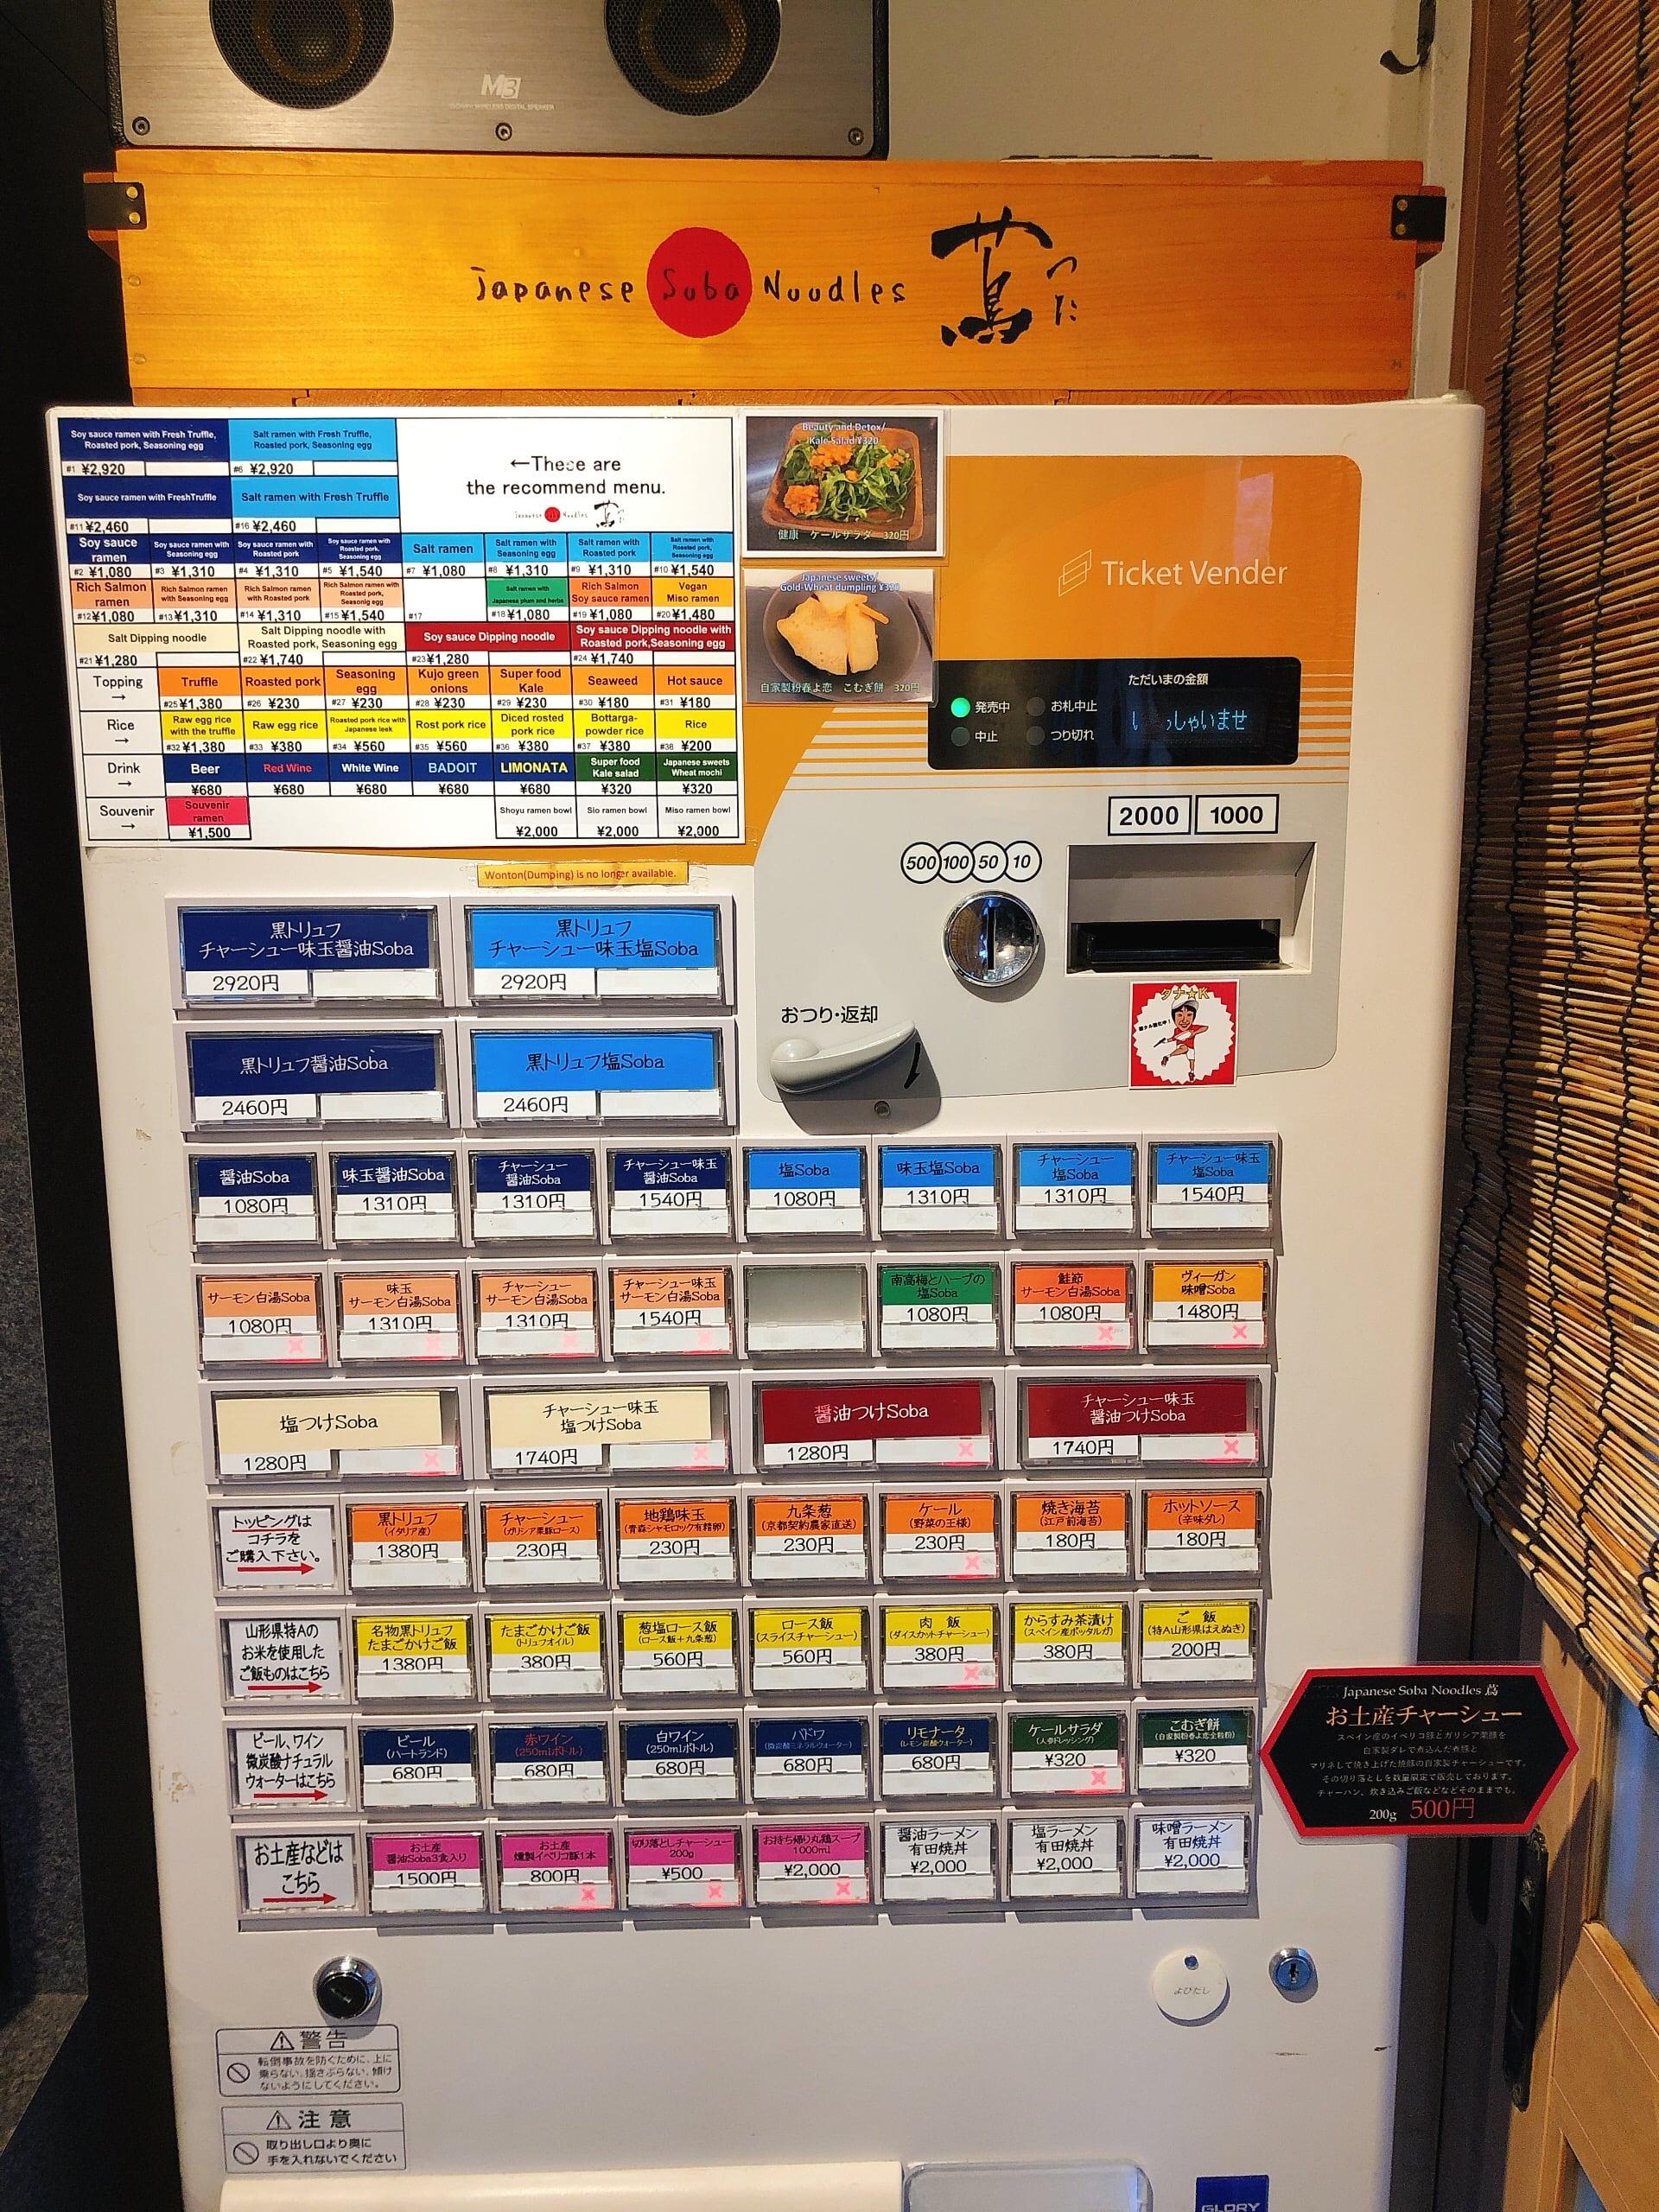 Ticket vending machine at Japanese Soba Noodles Tsuta